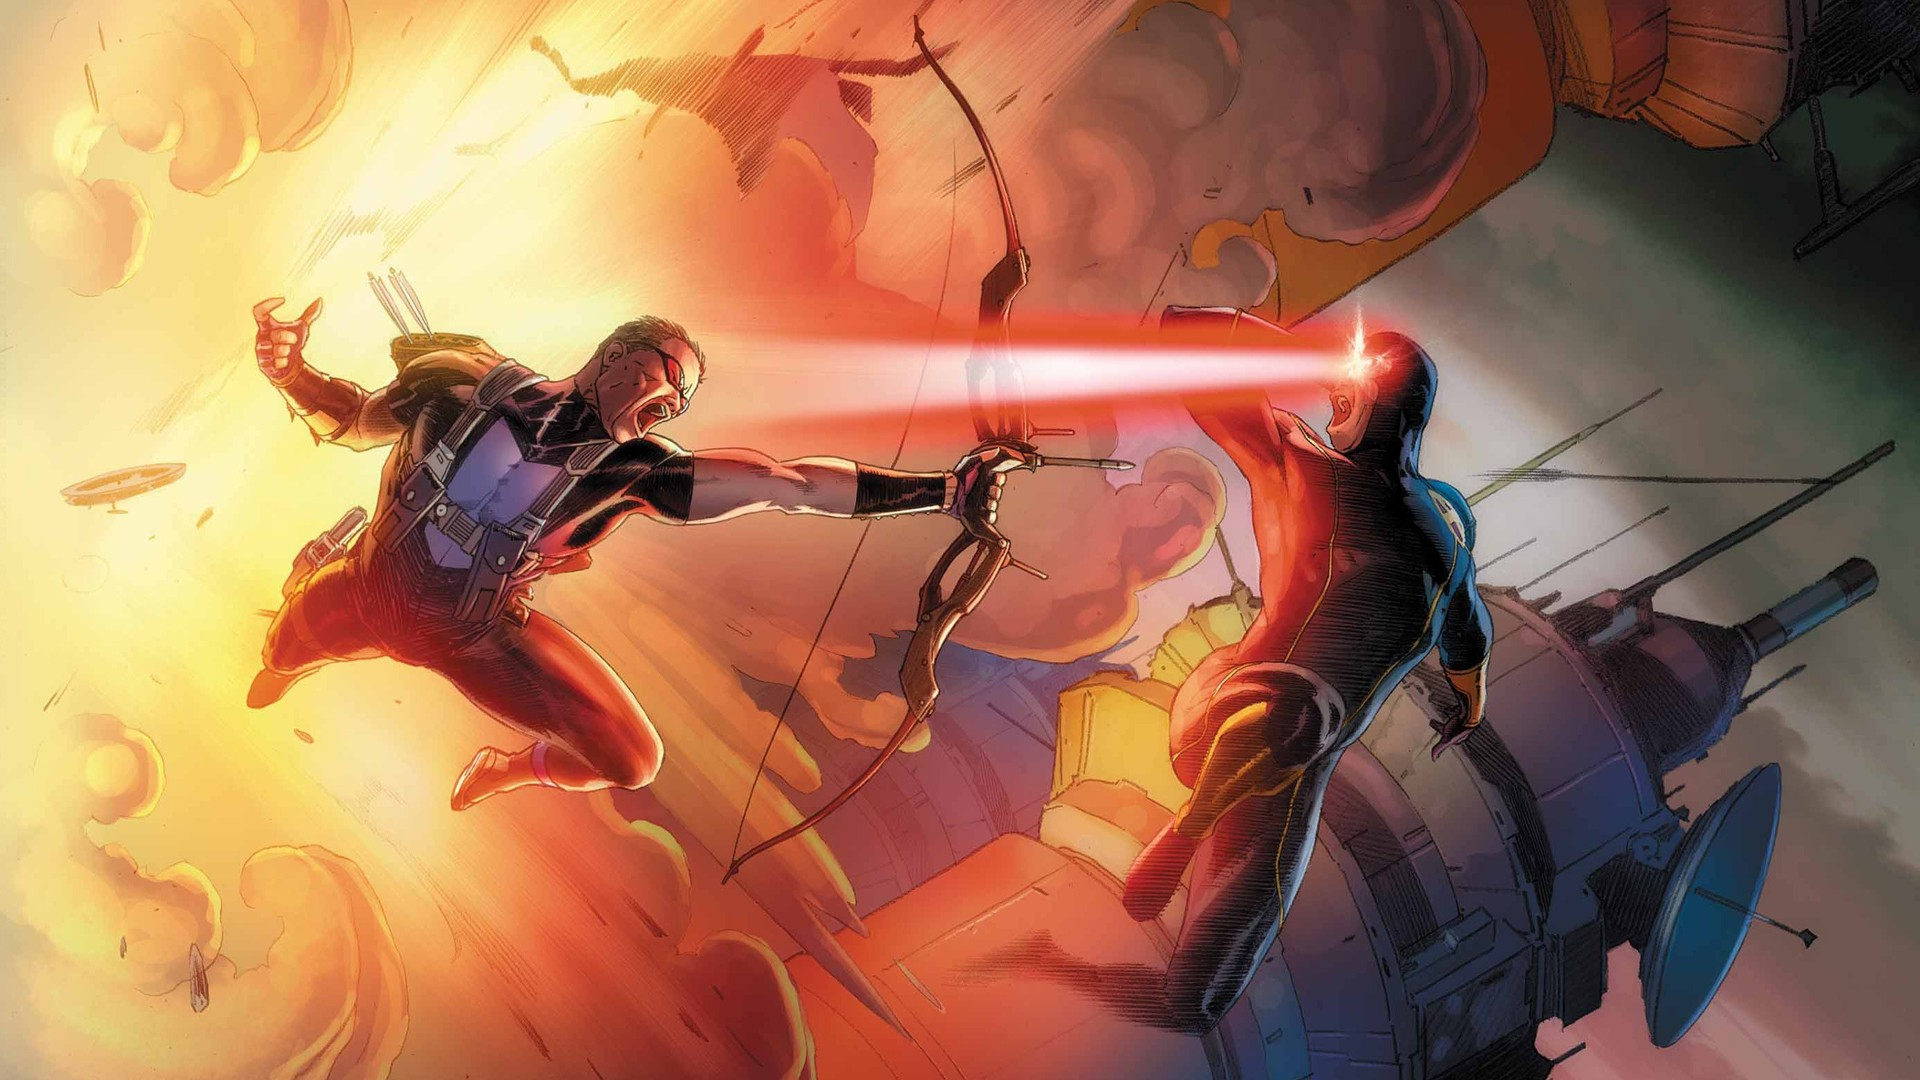 Avengers Vs X Men Hd Wallpaper Background Image 1920x1080